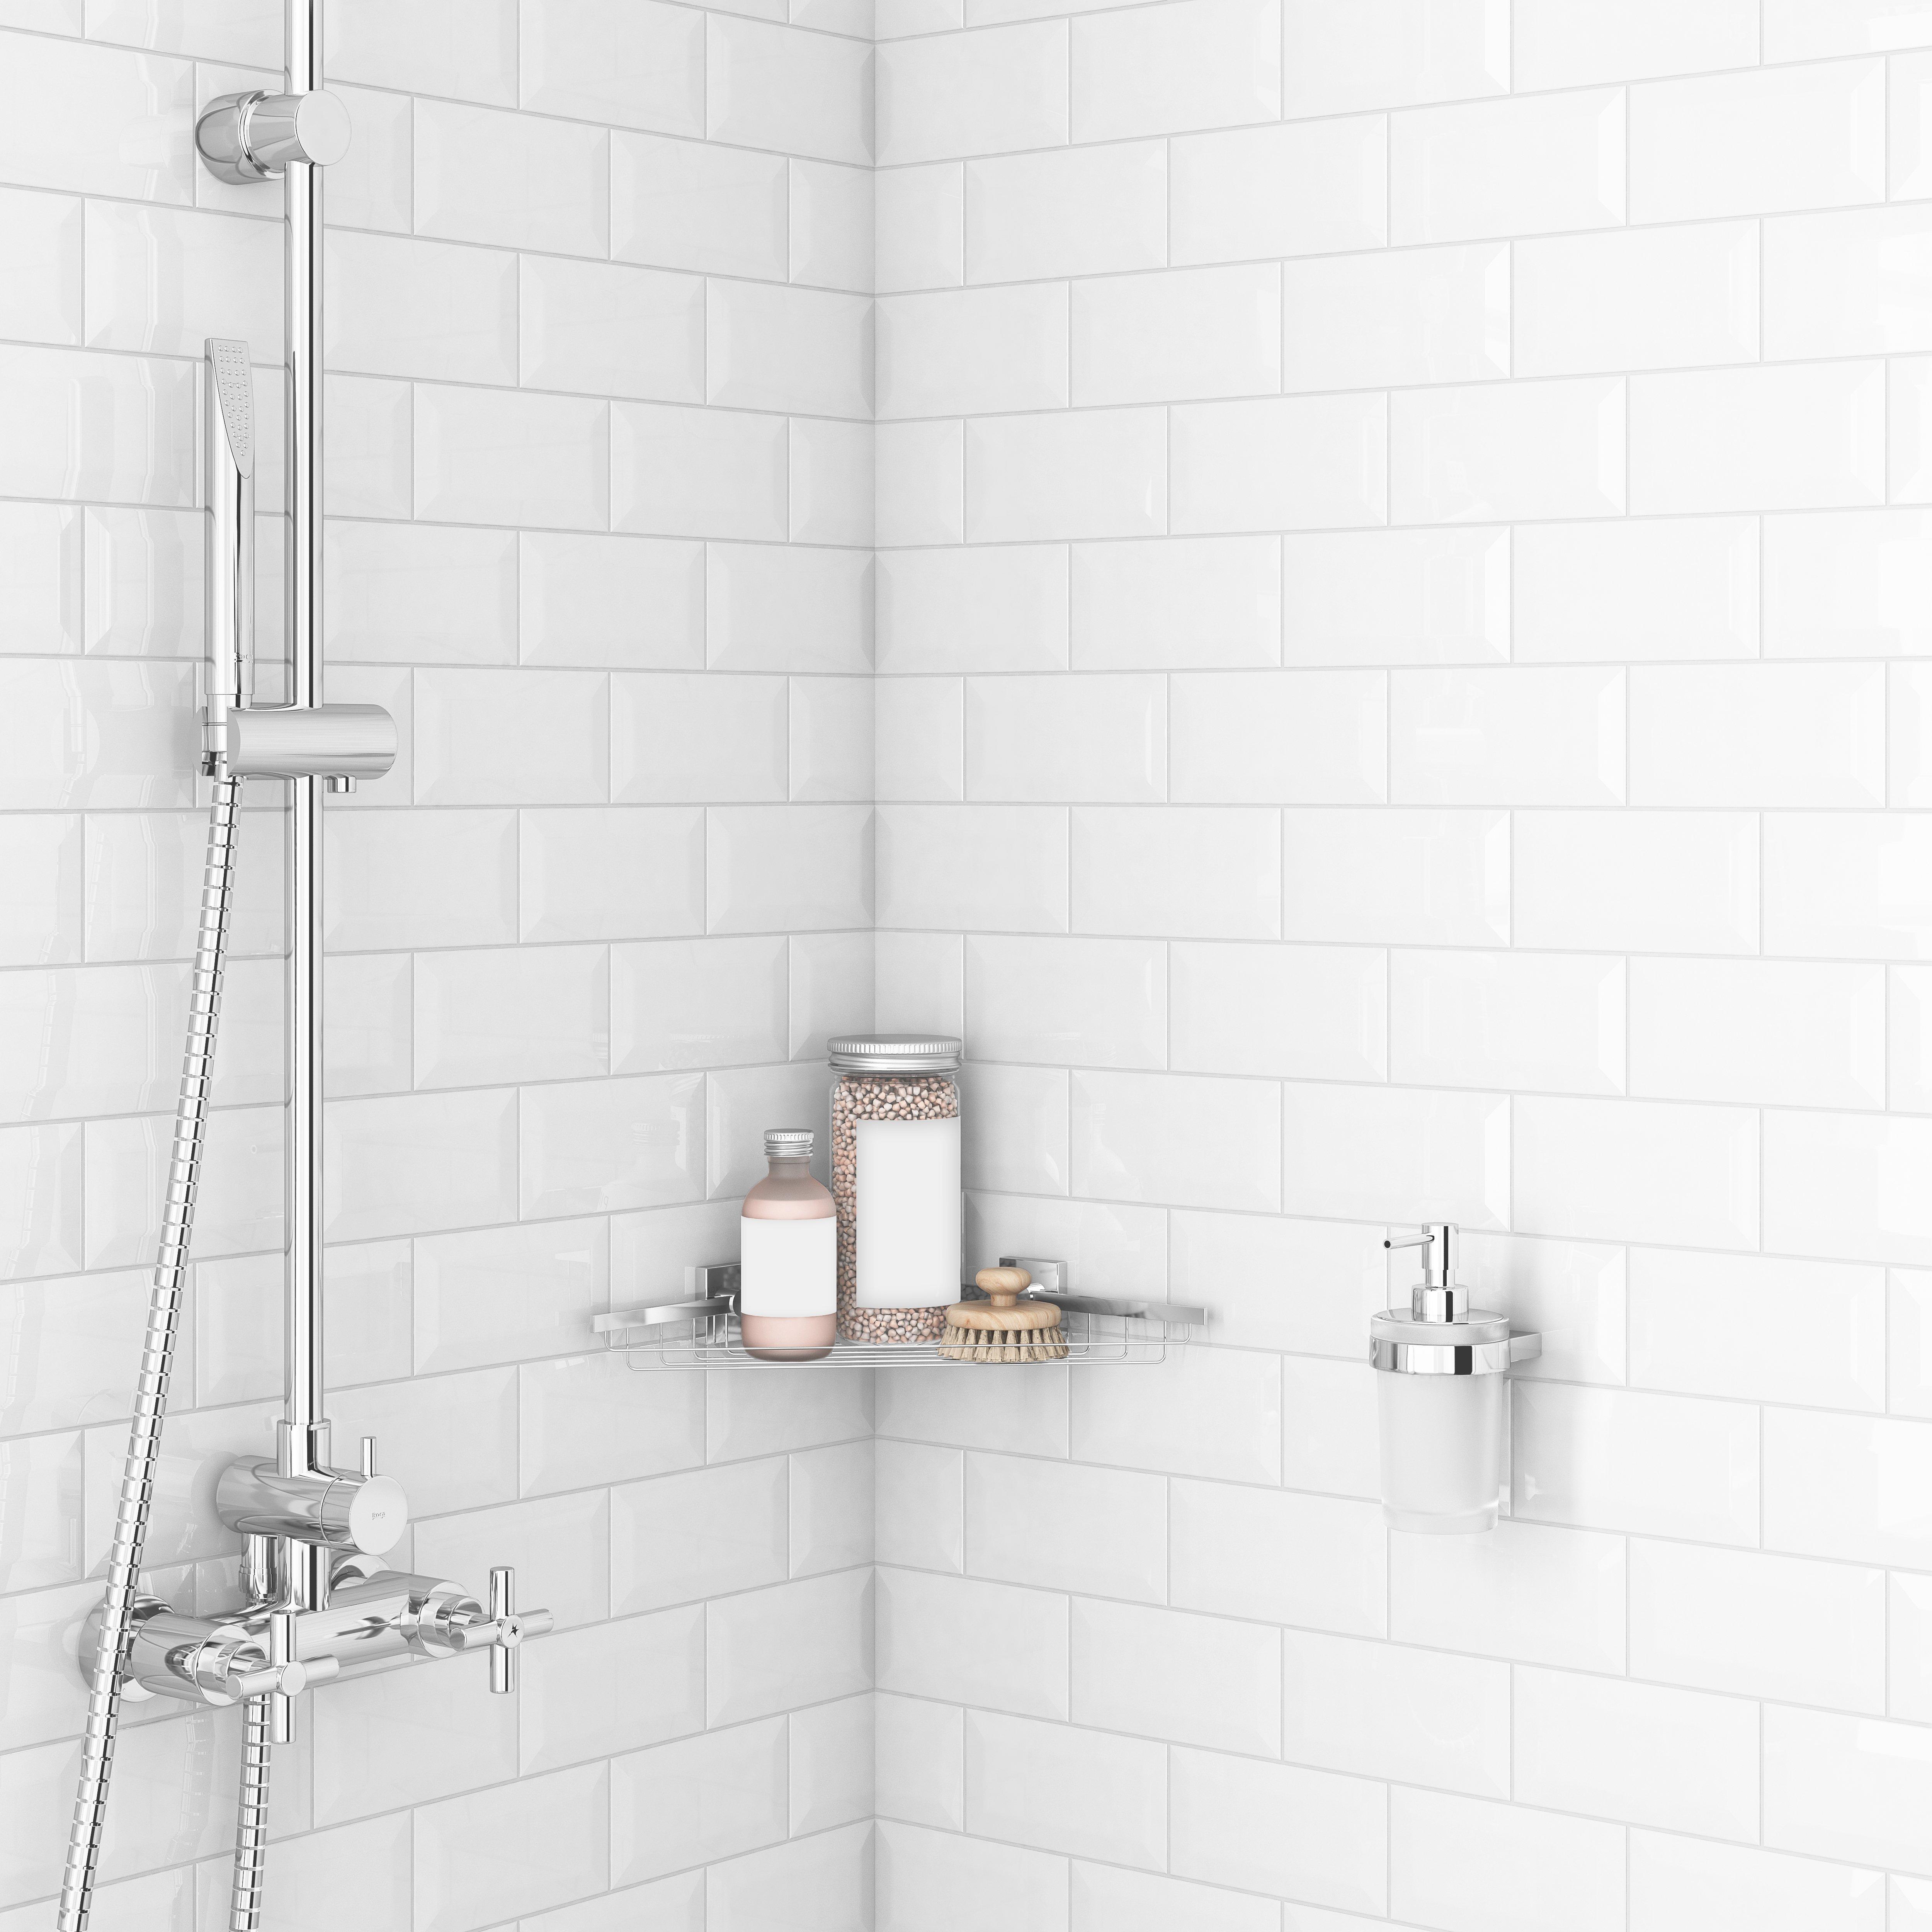 floor wall tiles home garden gray 3x6 beveled matte finish ceramic subway tile backsplash wall bath 360idcom fr